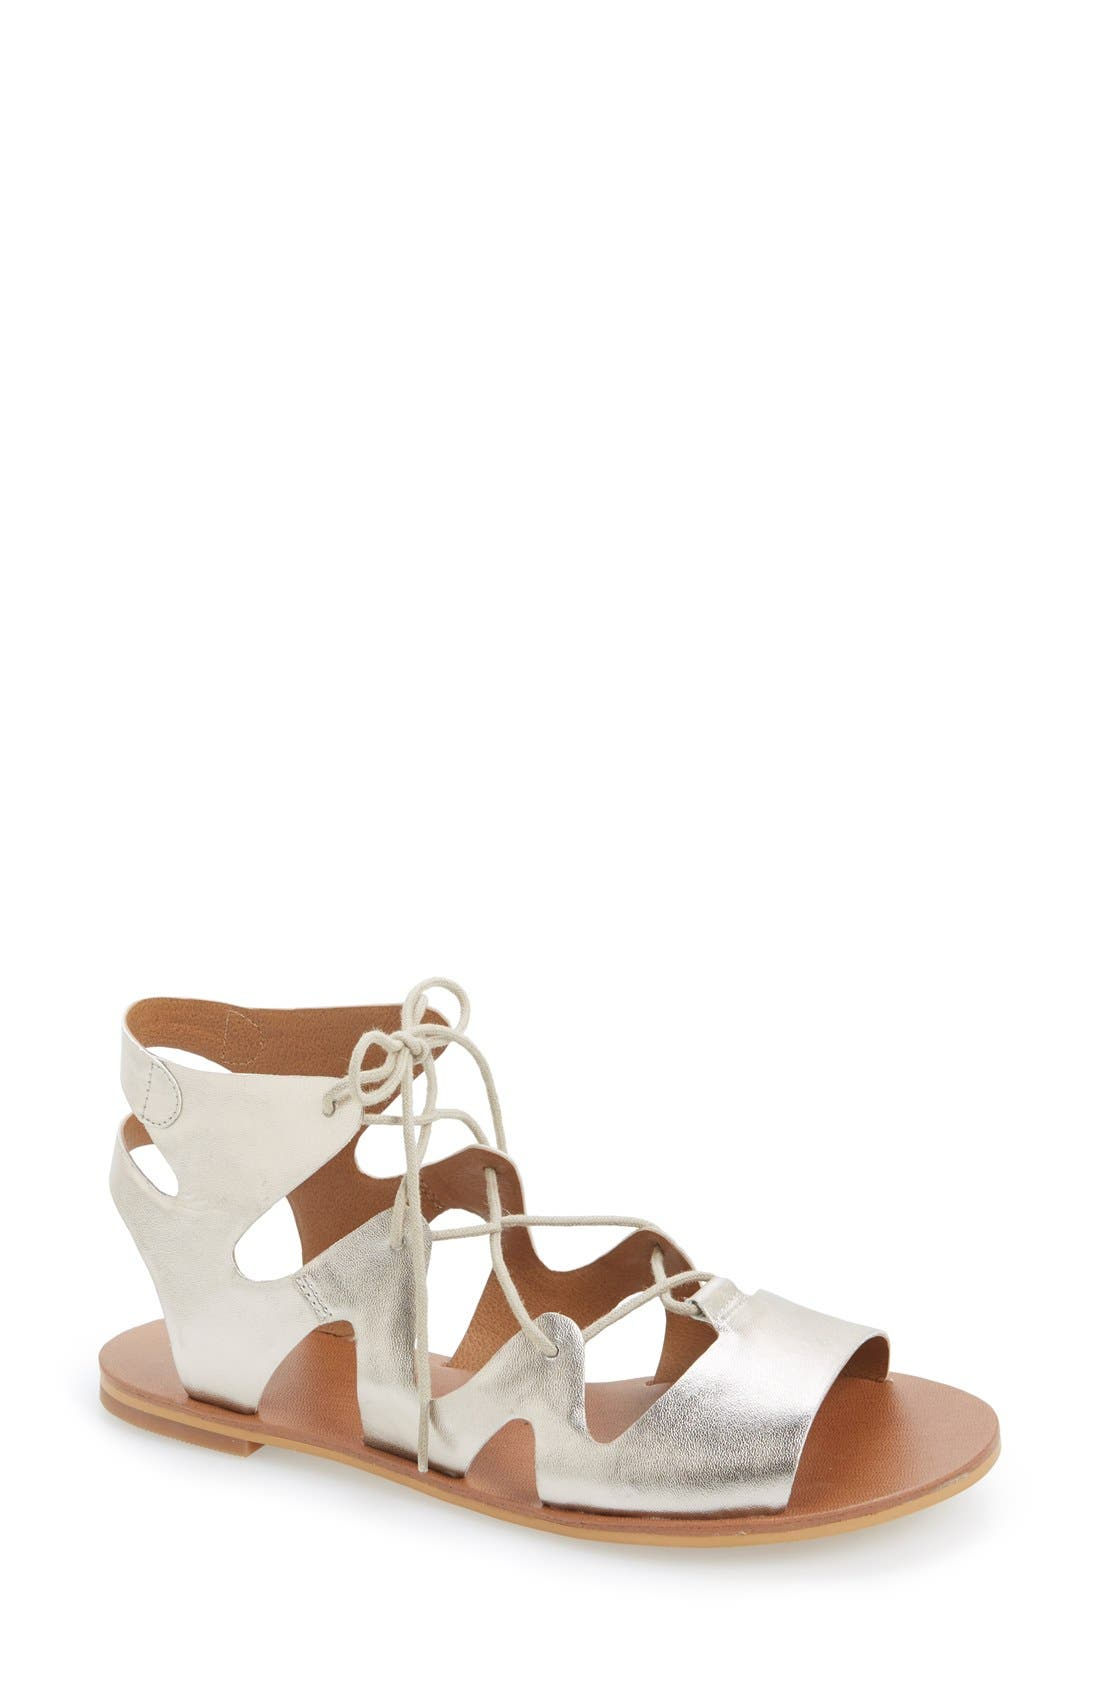 'Alyona' Lace-Up Gladiator Sandal,                             Main thumbnail 1, color,                             Platinum Faux Leather